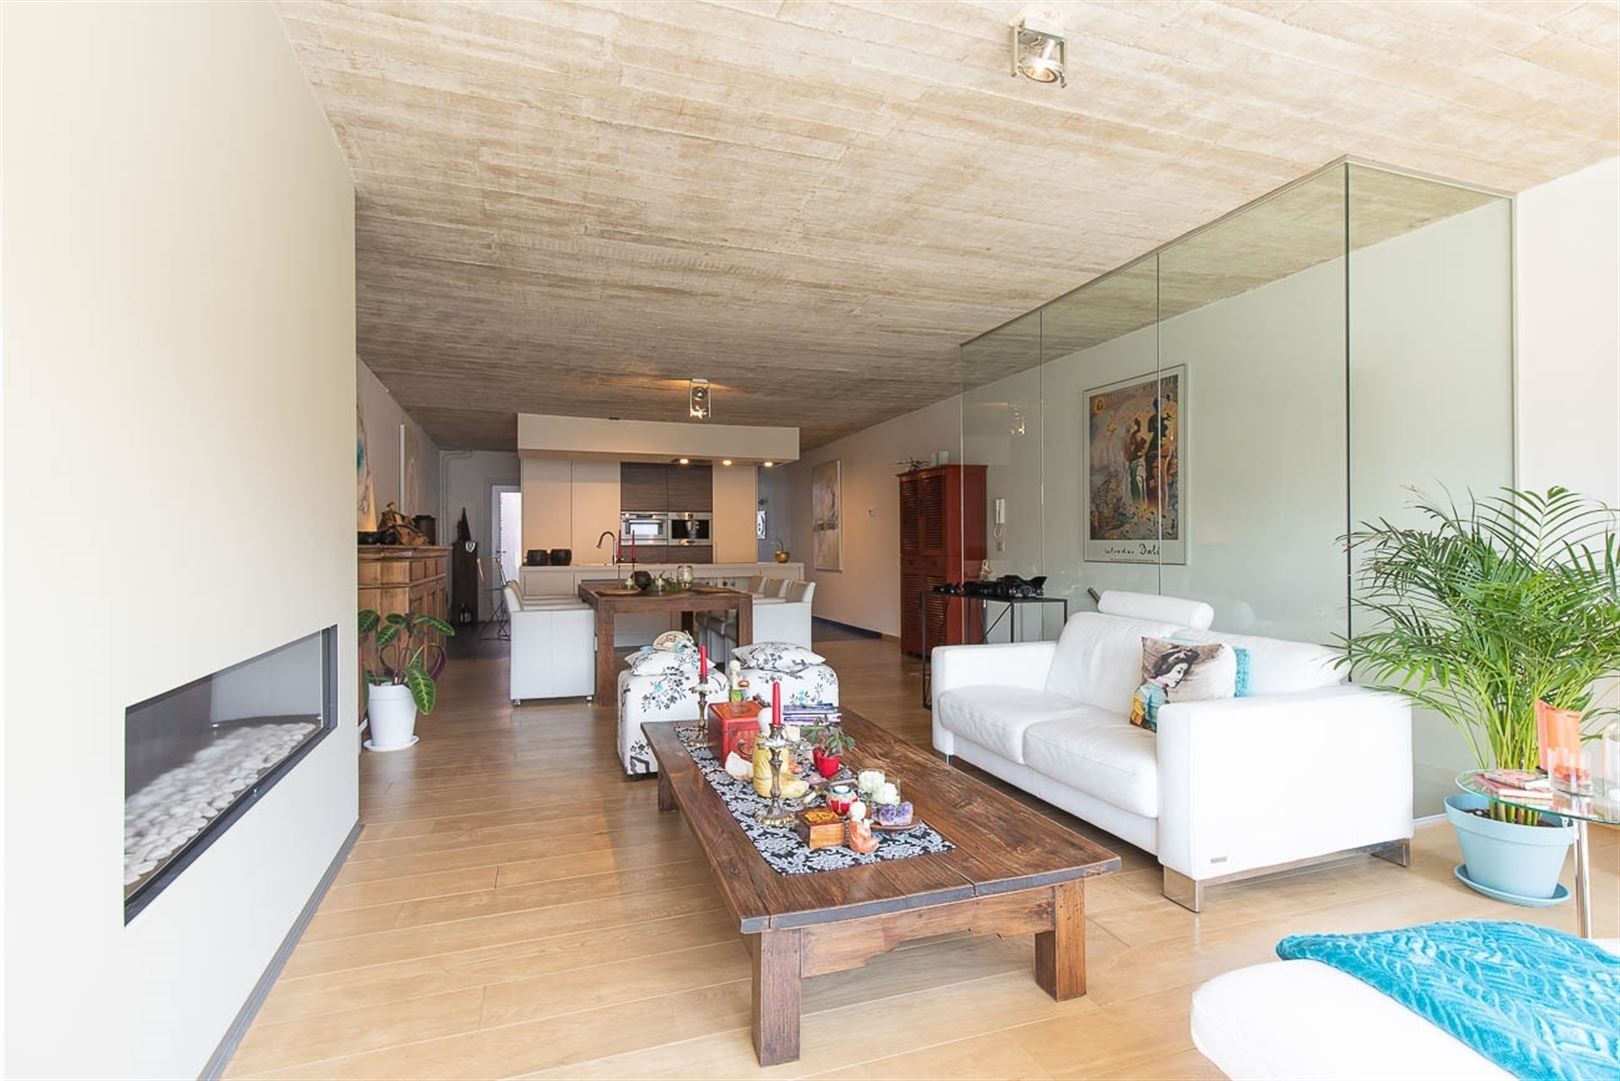 Foto 3 : Woning te 9200 DENDERMONDE (België) - Prijs € 495.000